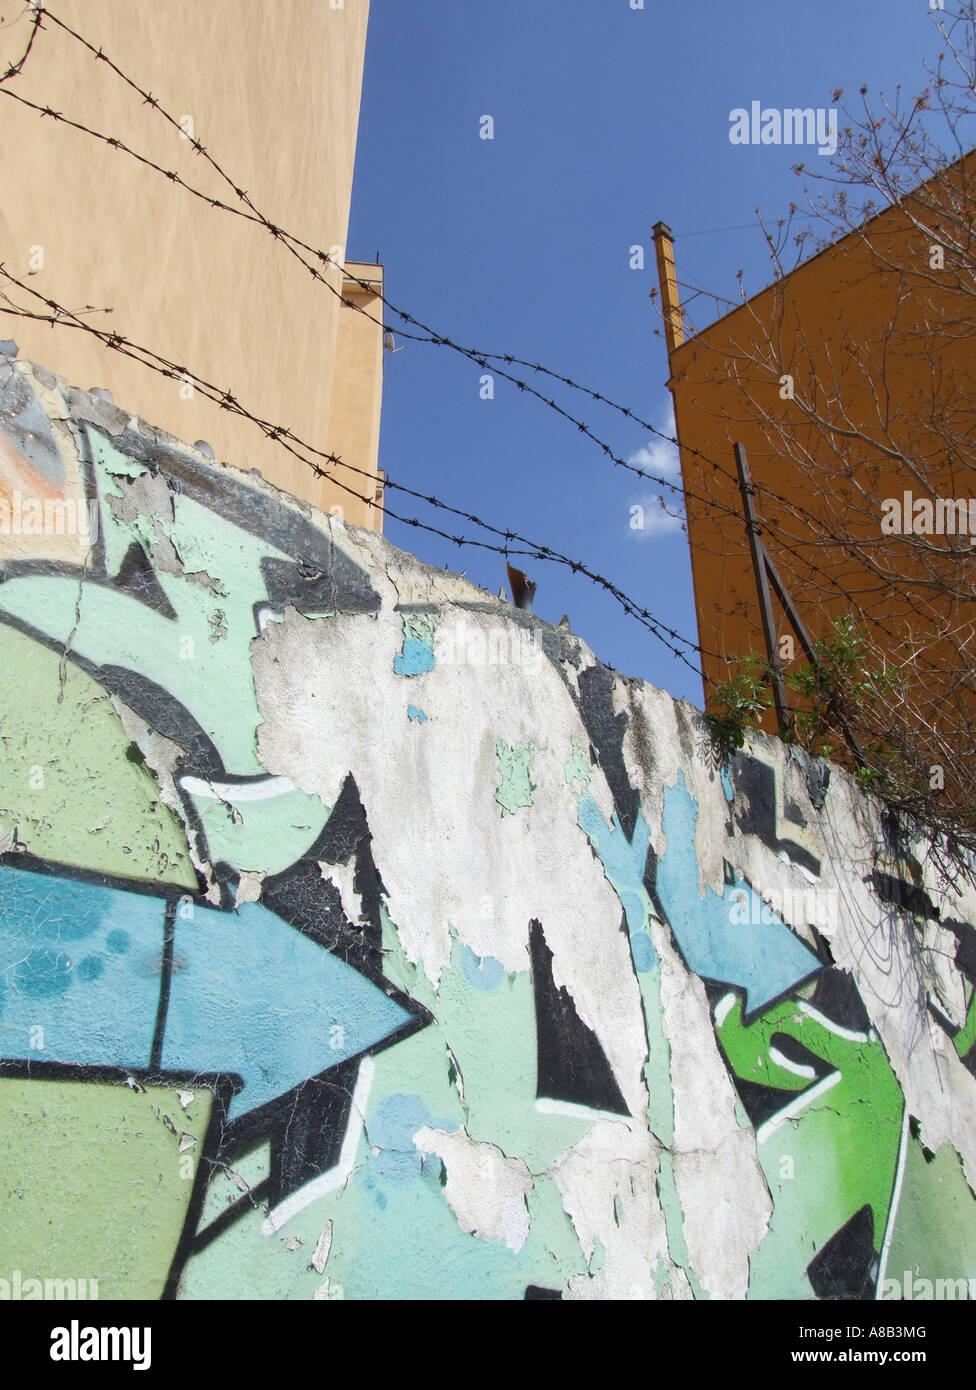 Graffiti in the san lorenzo area of rome italy